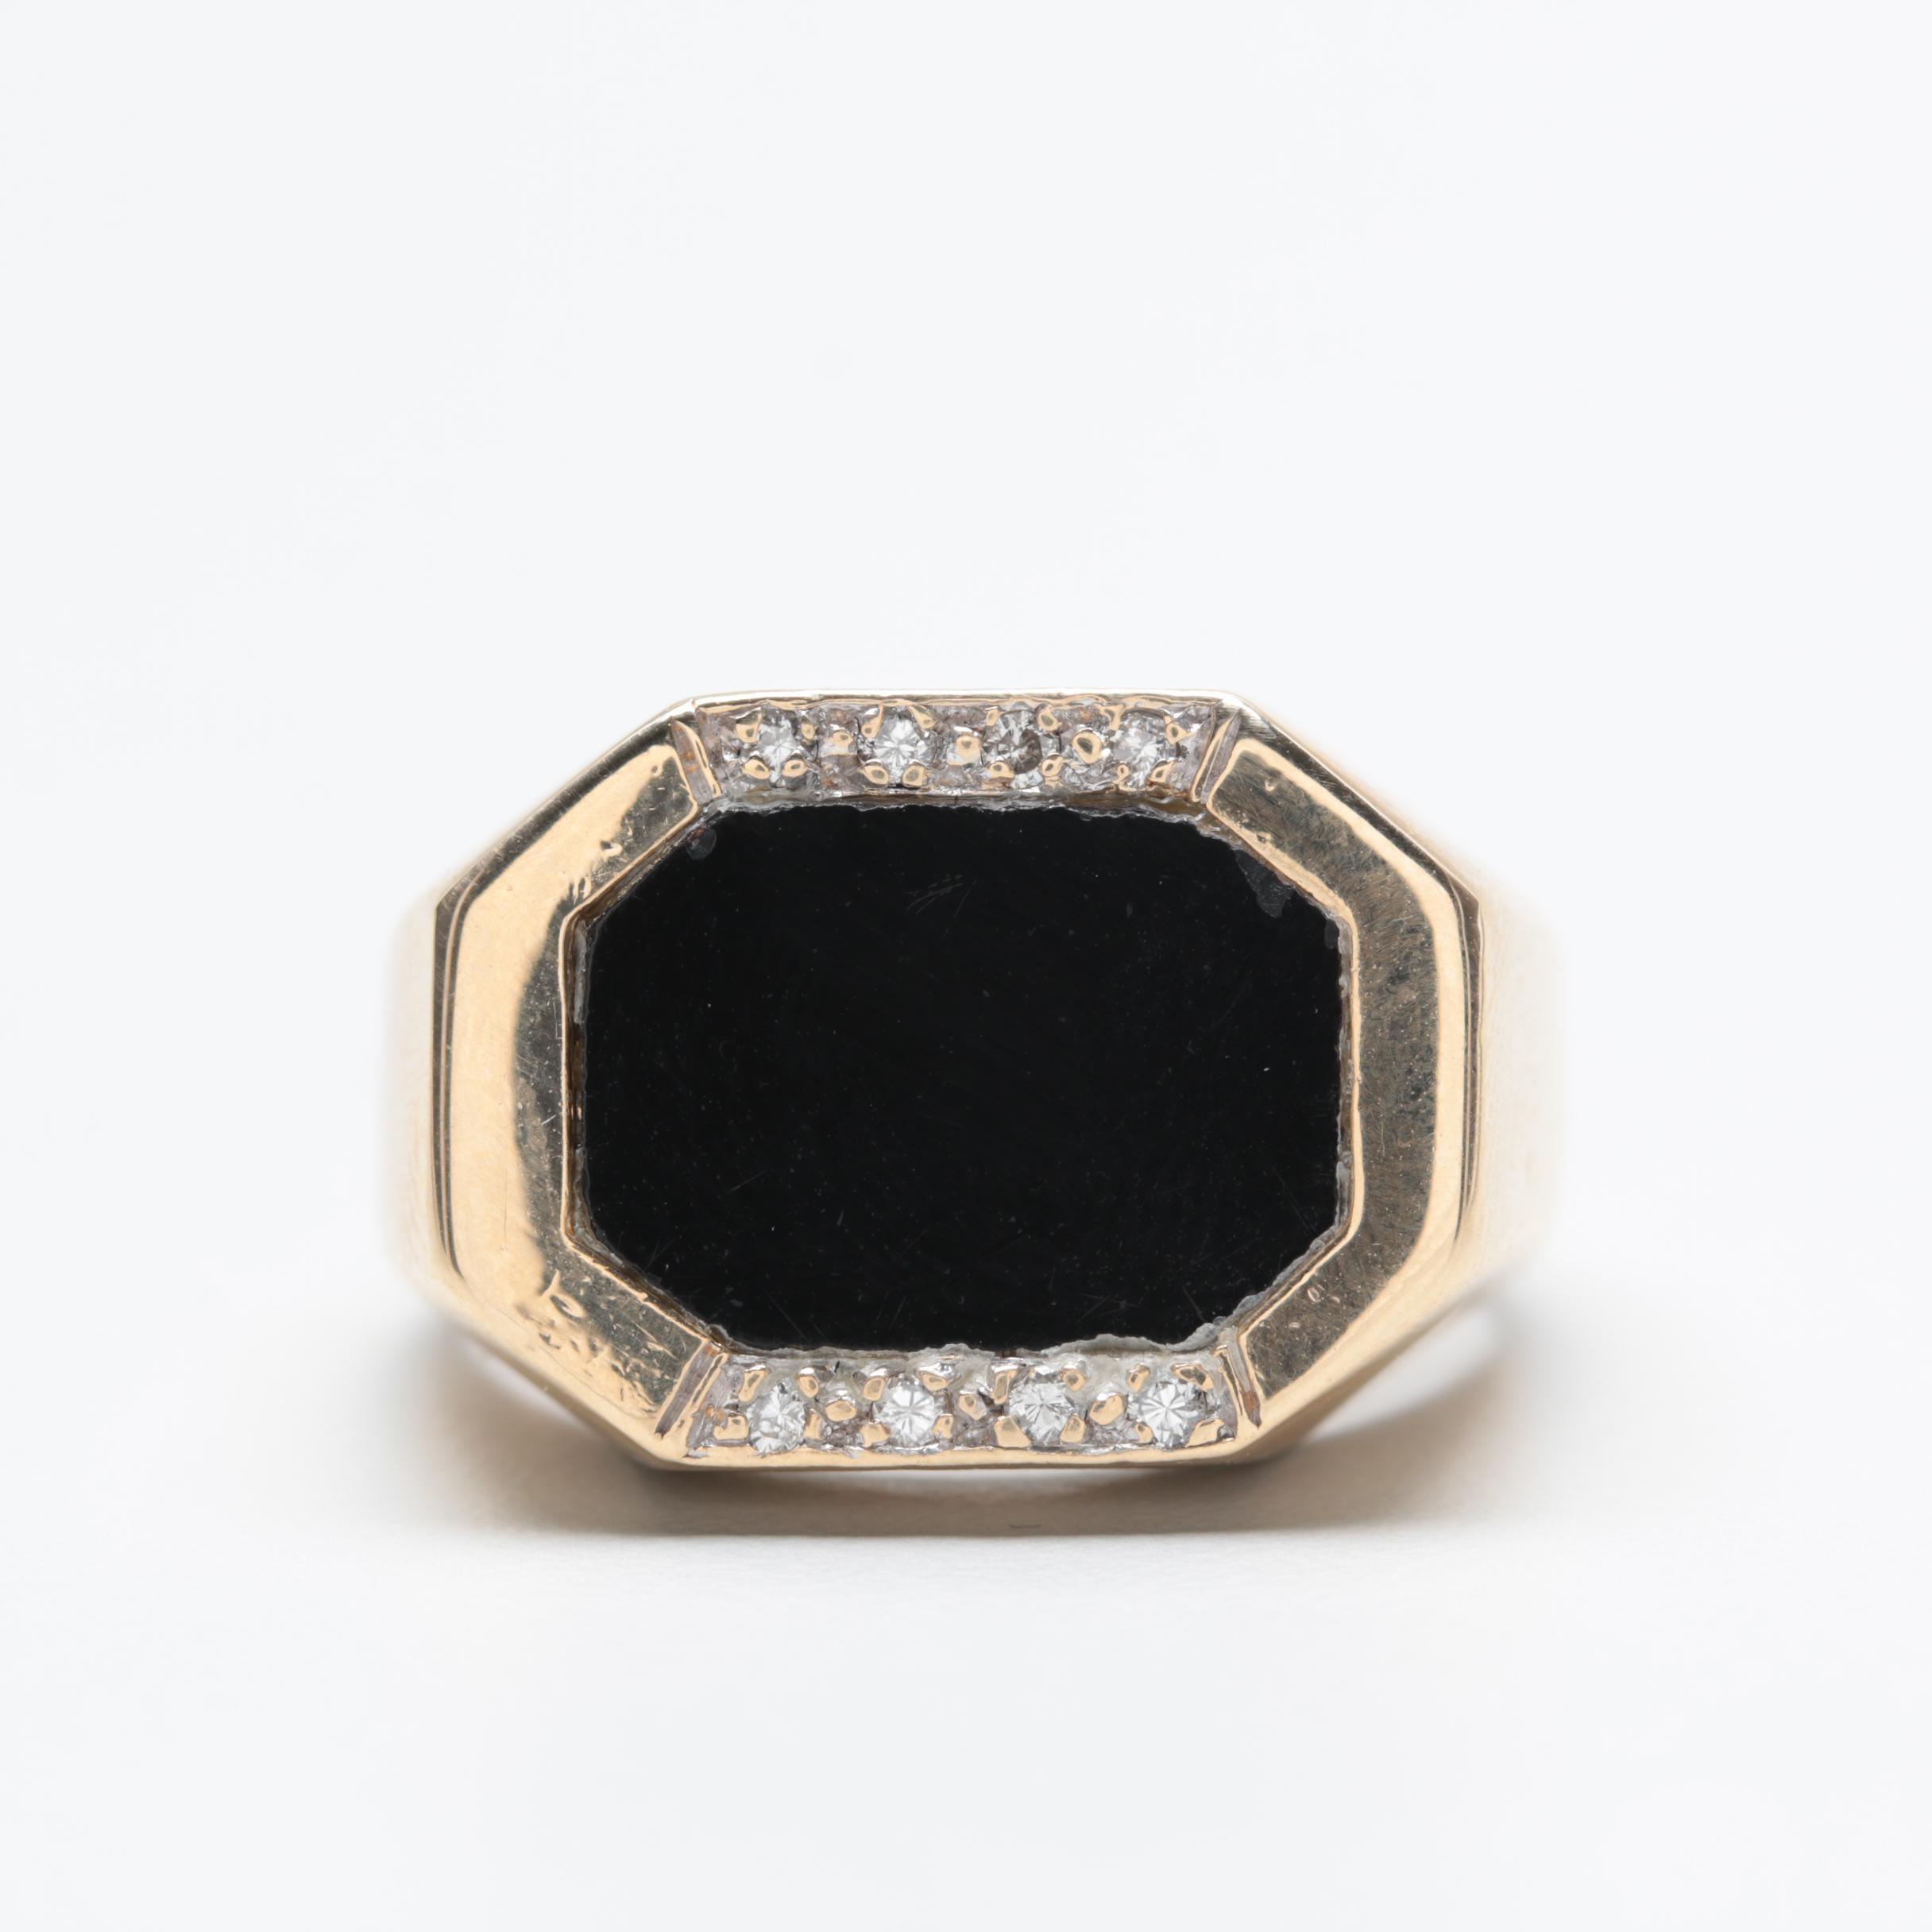 Vintage 14K Yellow Gold Black Onyx and Diamond Ring